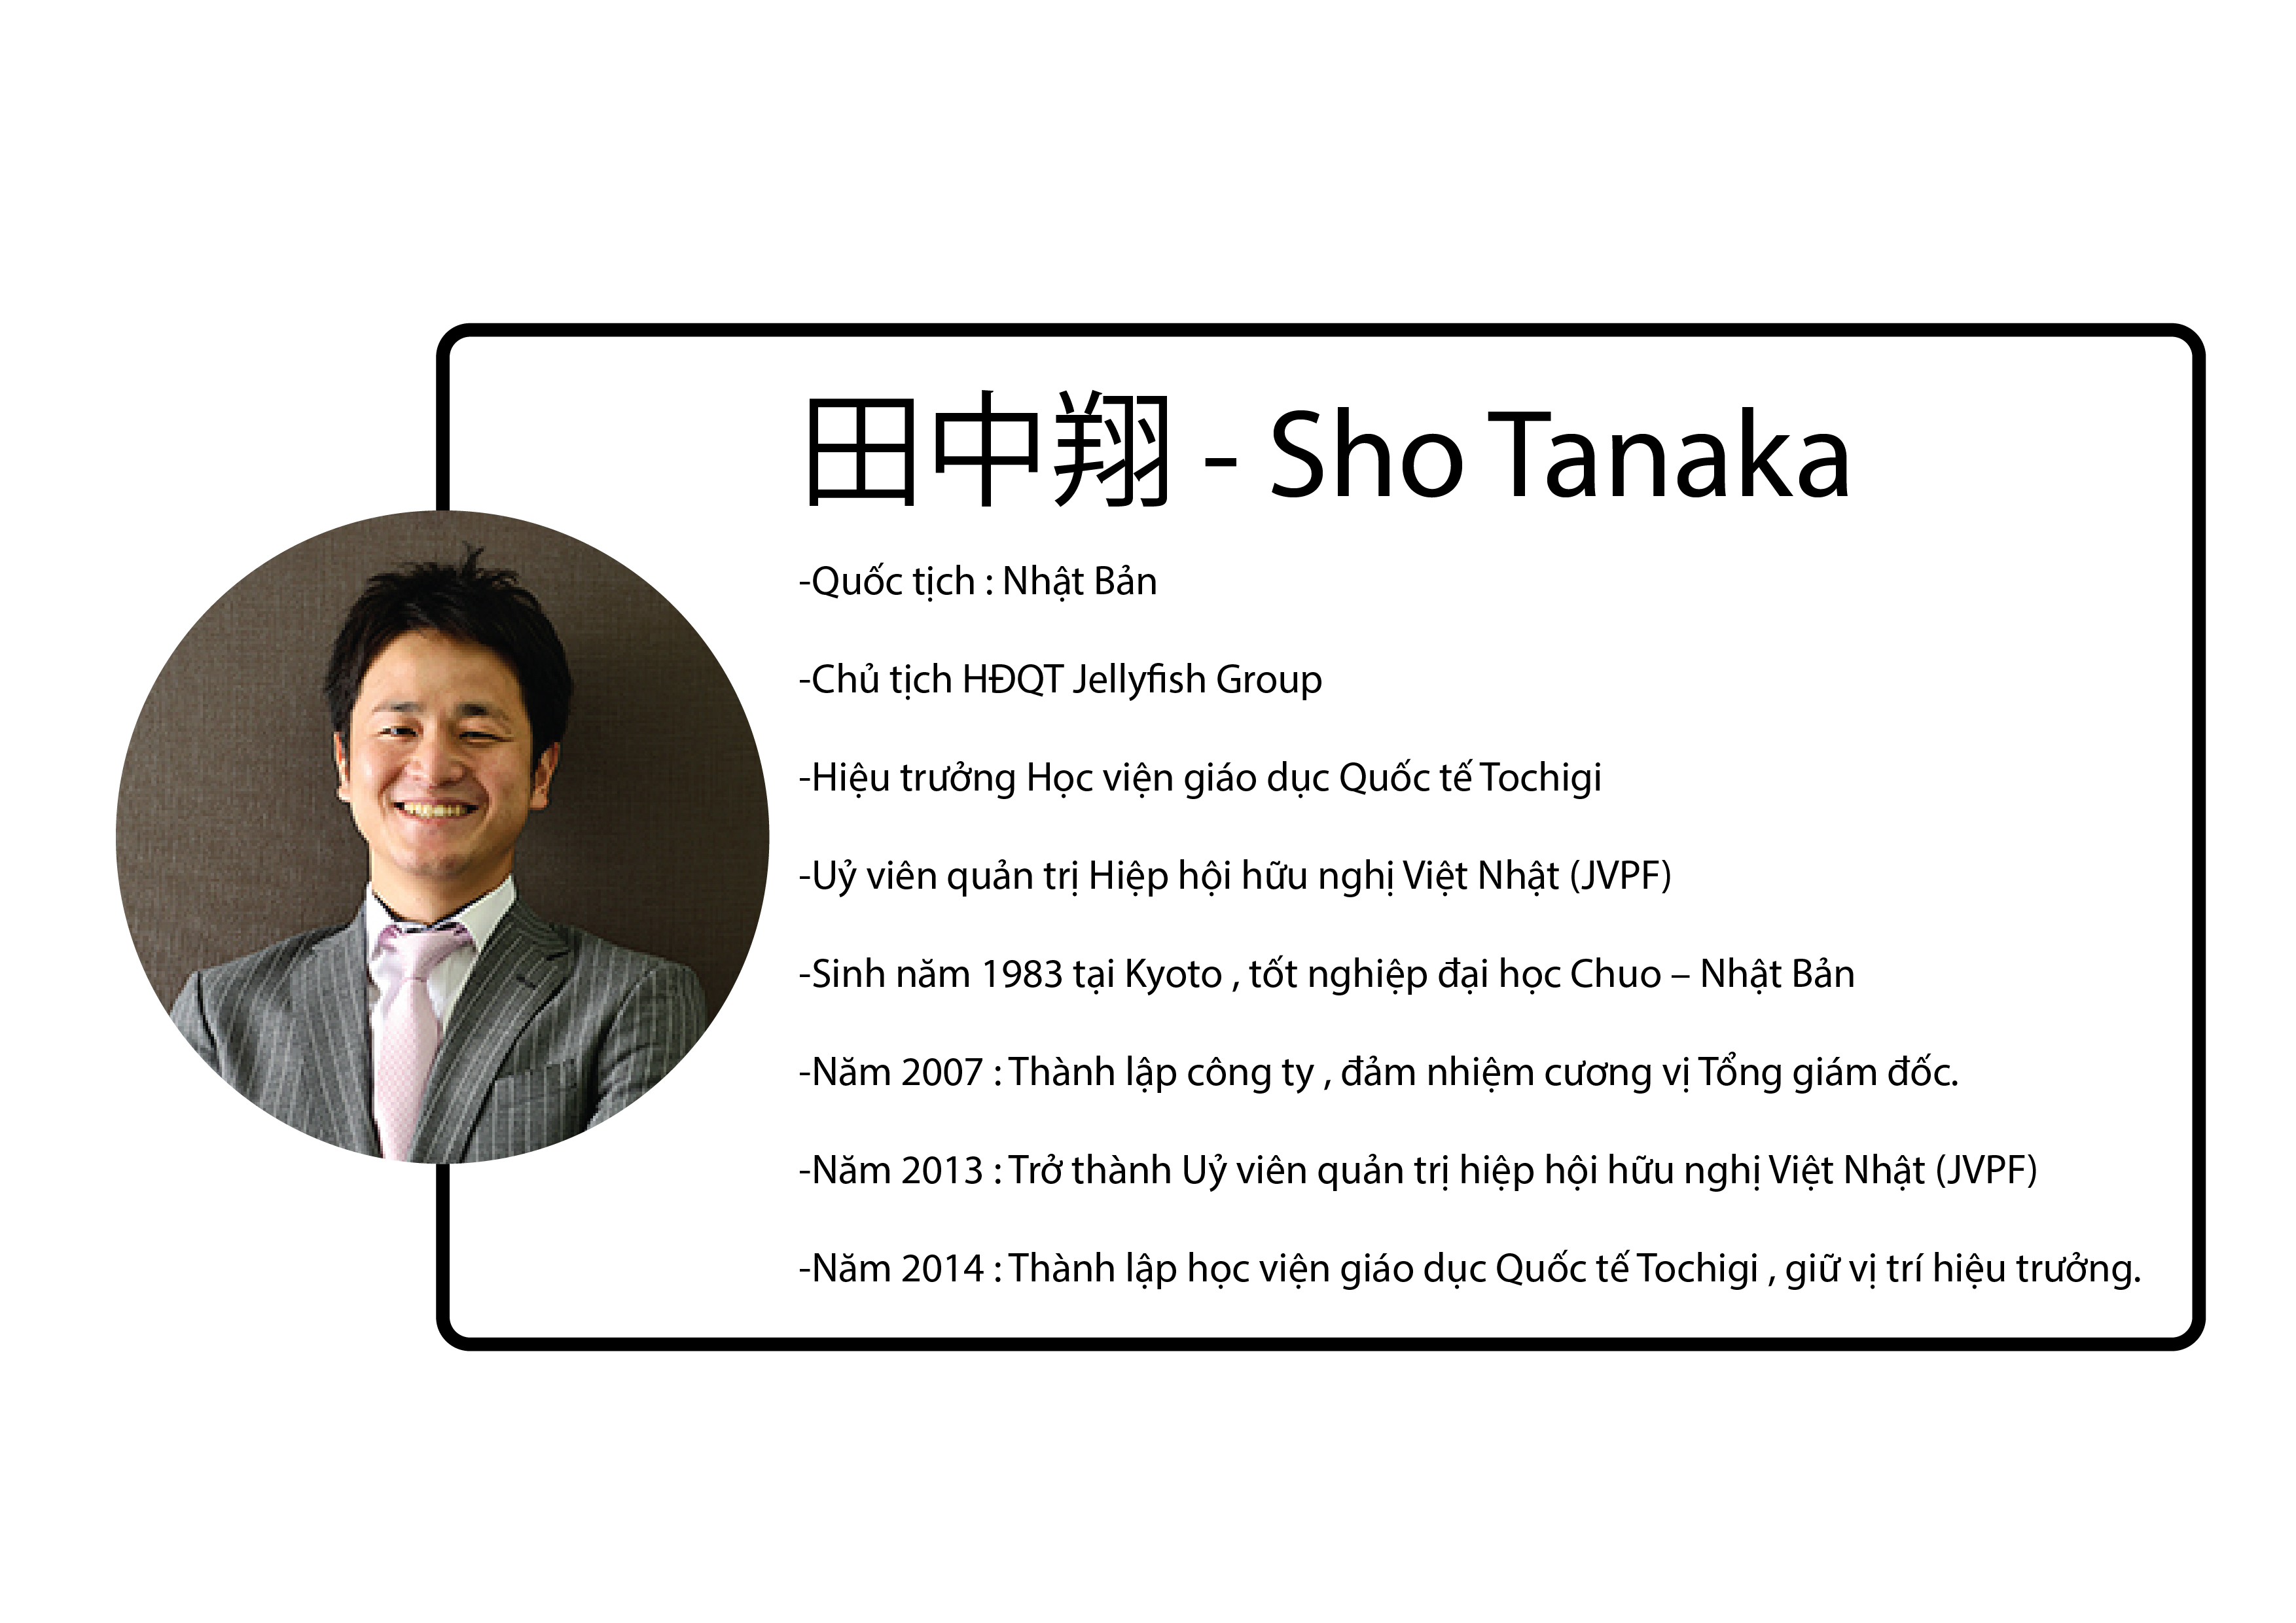 田中翔 - Sho Tanaka-01 (1)